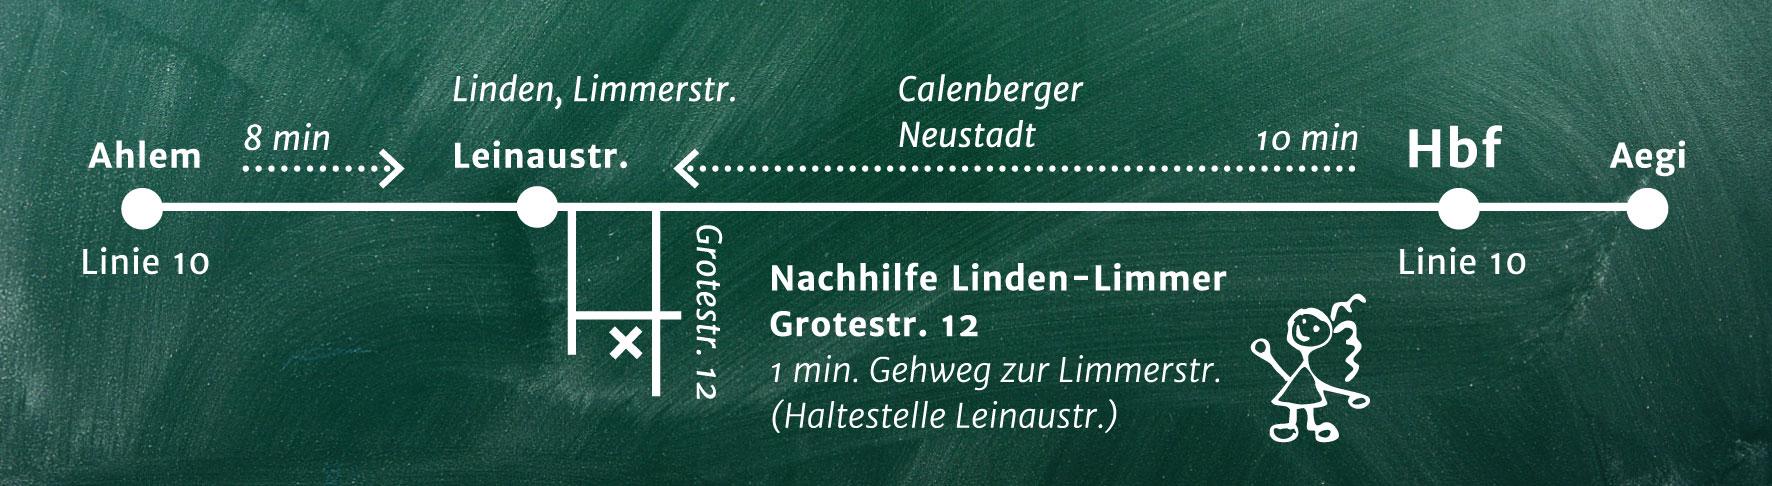 Nachhilfe Hannover Ahlem und Calenberger Neustadt Hannover